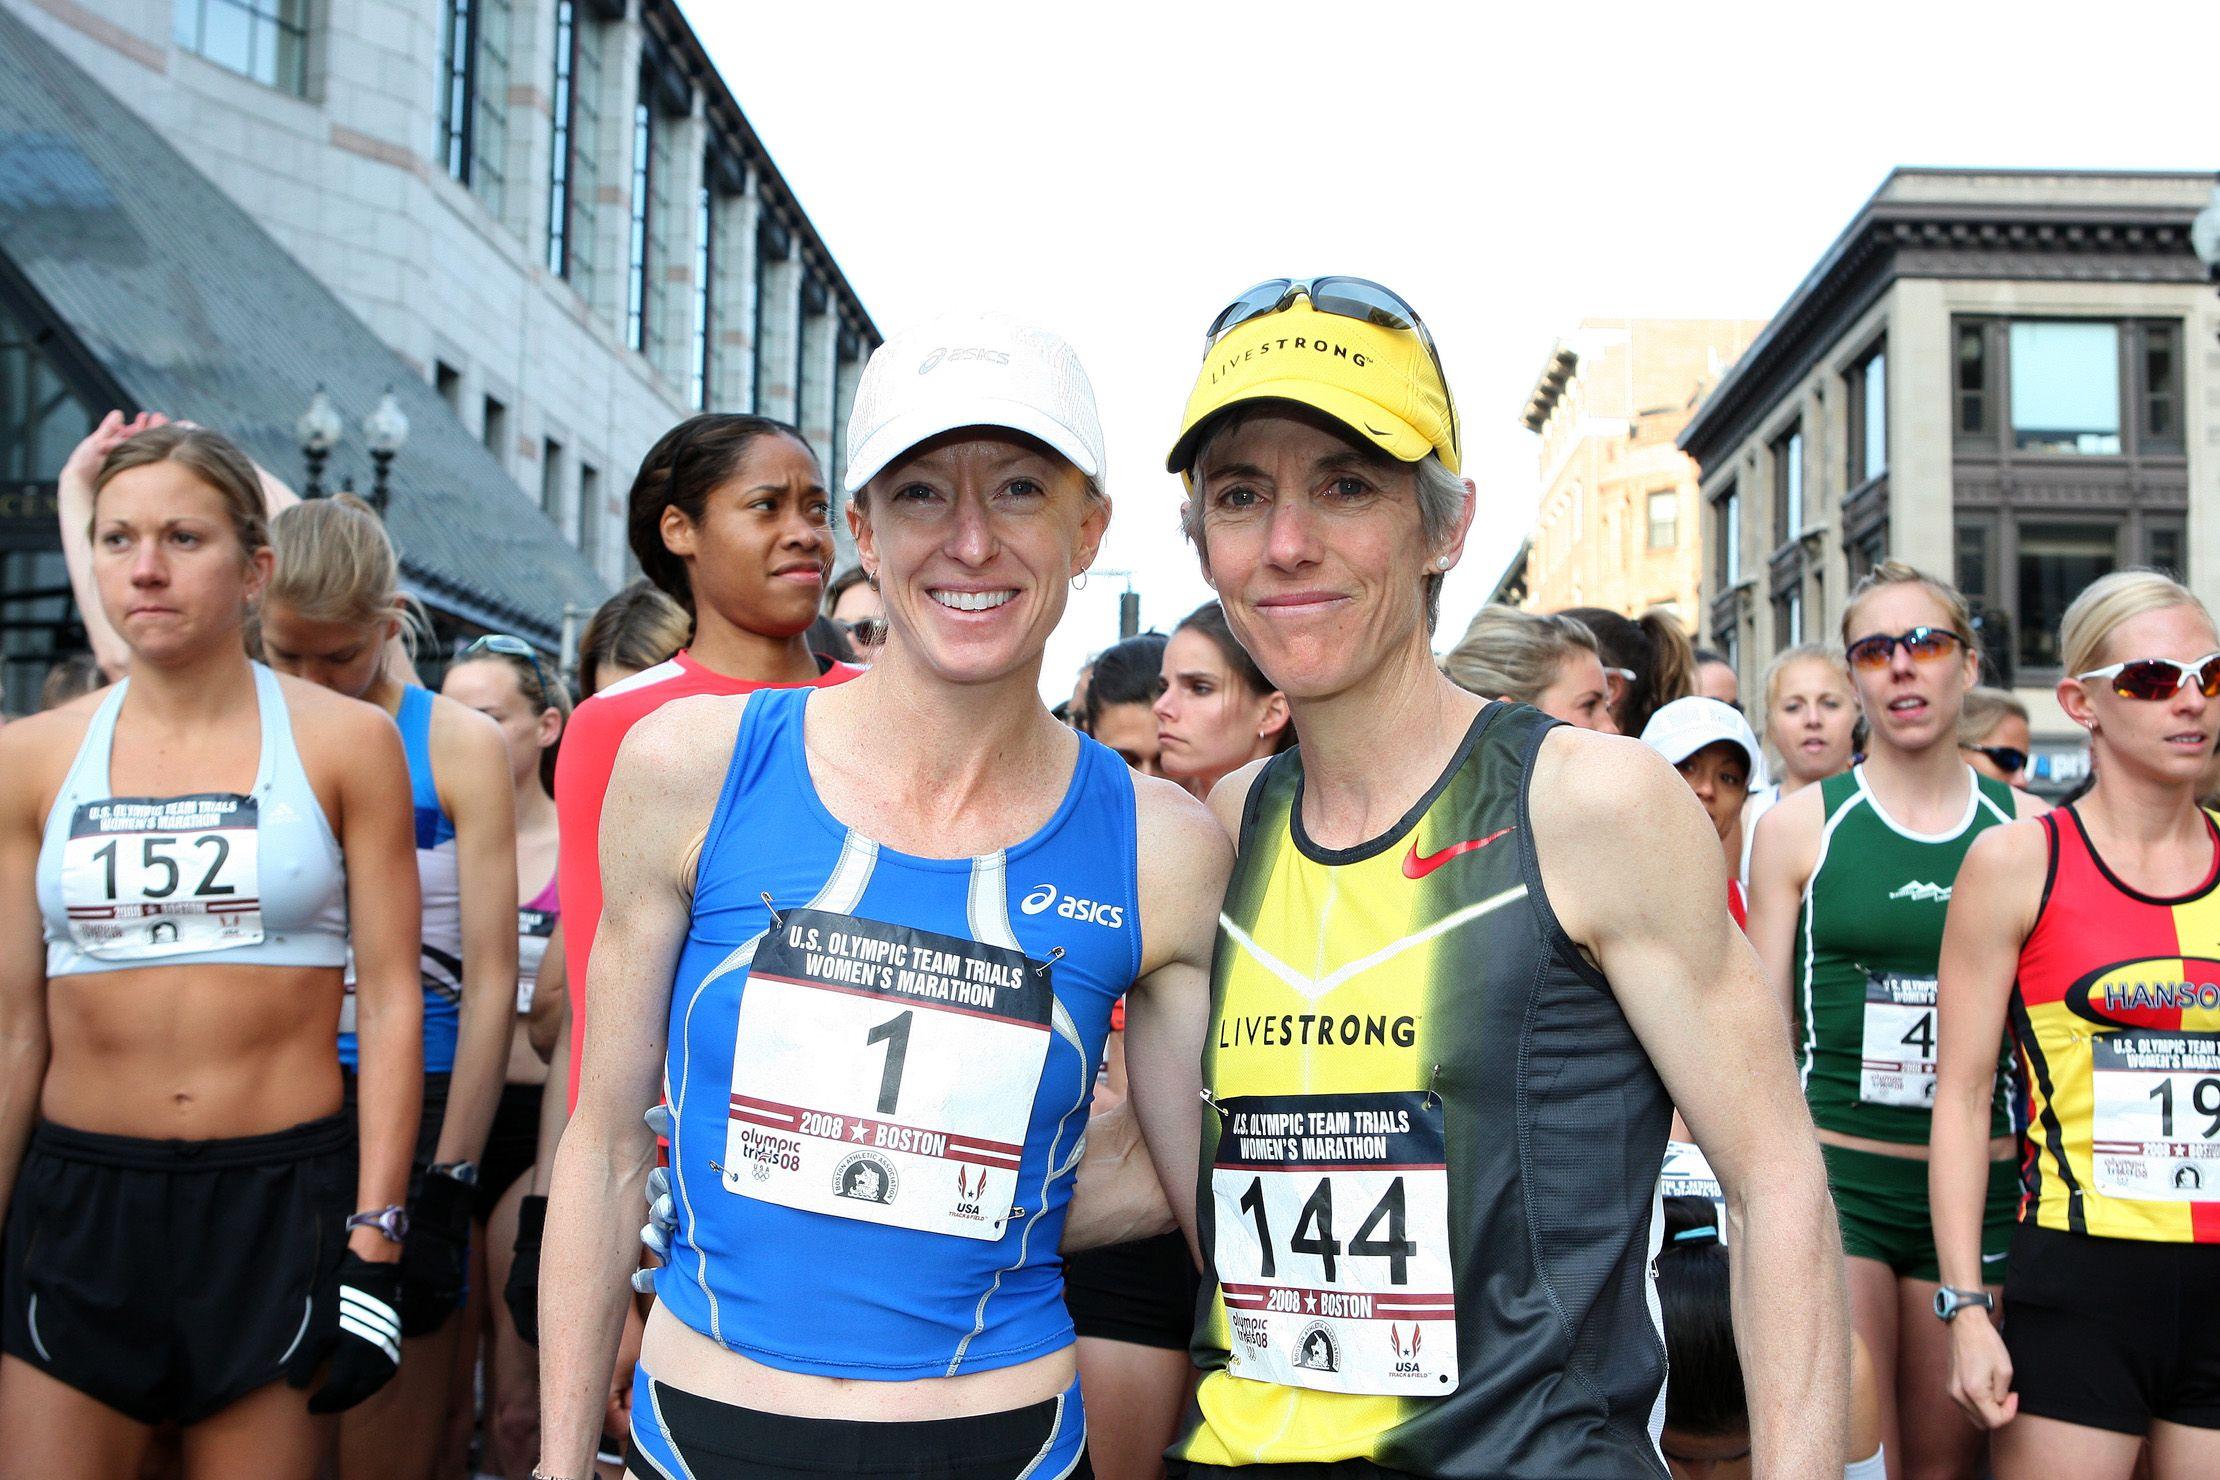 Communication on this topic: Indus Arthur, joan-benoit-samuelson-olympic-medal-in-marathon/